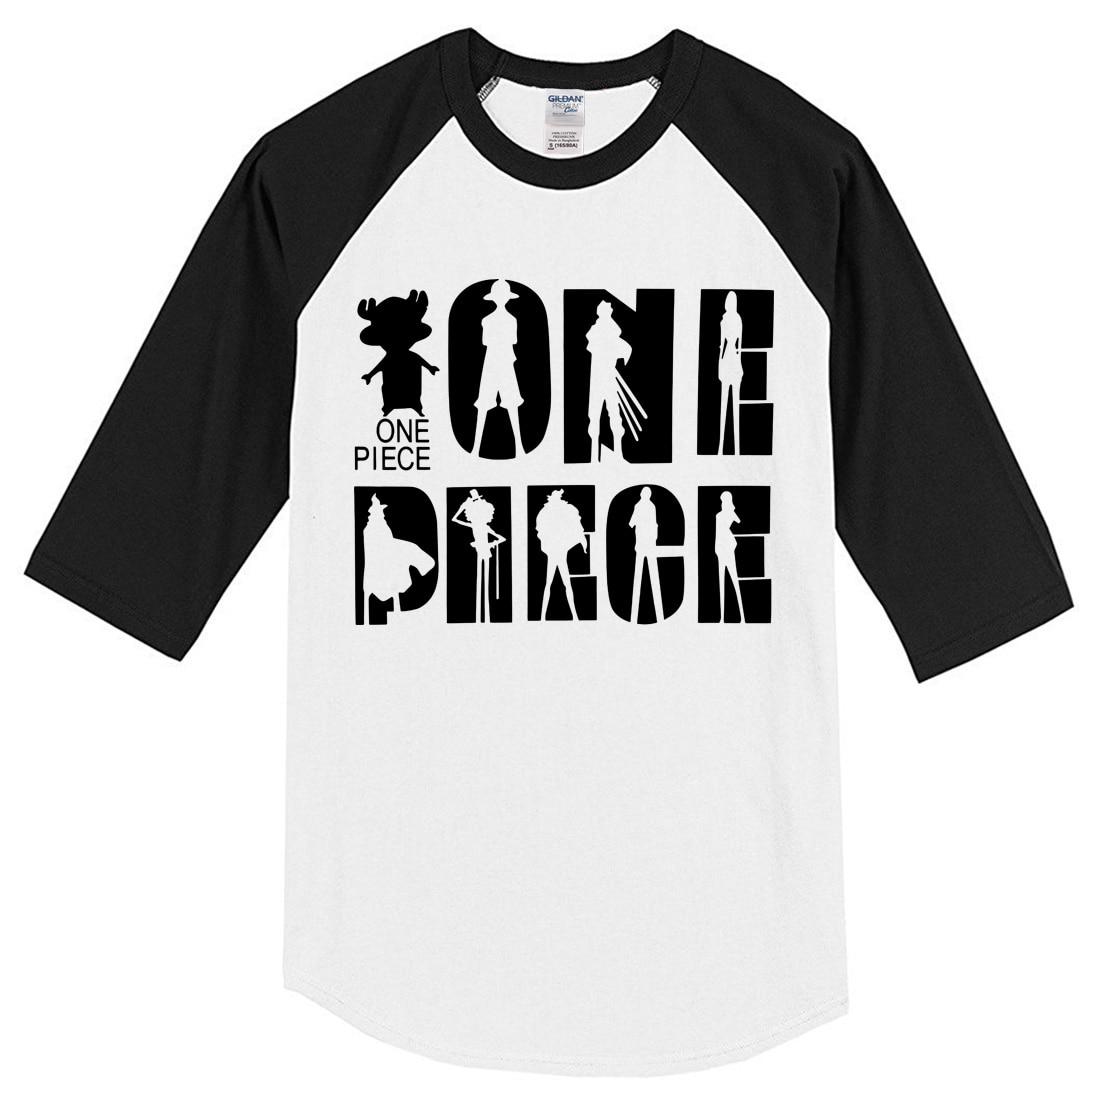 T-shirt for men summer 2019 cotton tshirt three quarter sleeve raglan men's sportswear Japan Anime One Piece fashion brand top